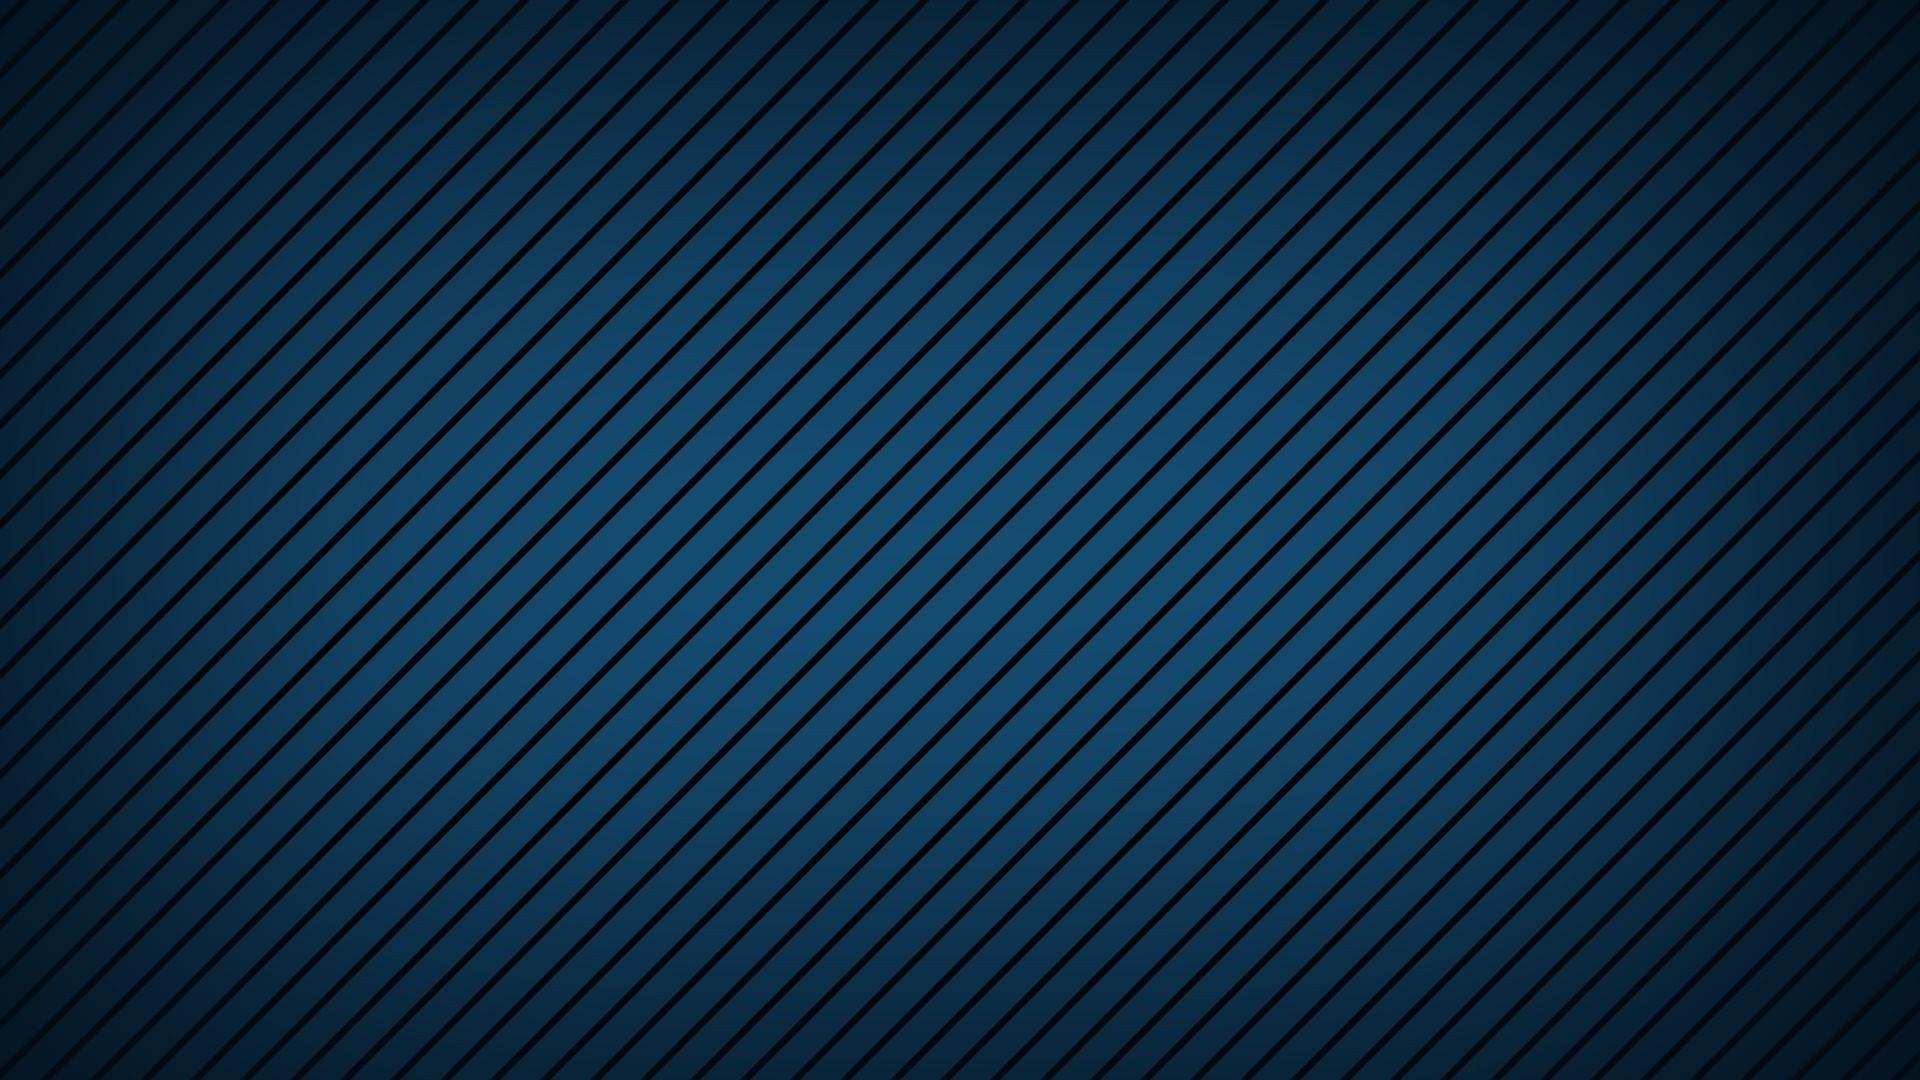 47 Blue Patterned Wallpaper On Wallpapersafari